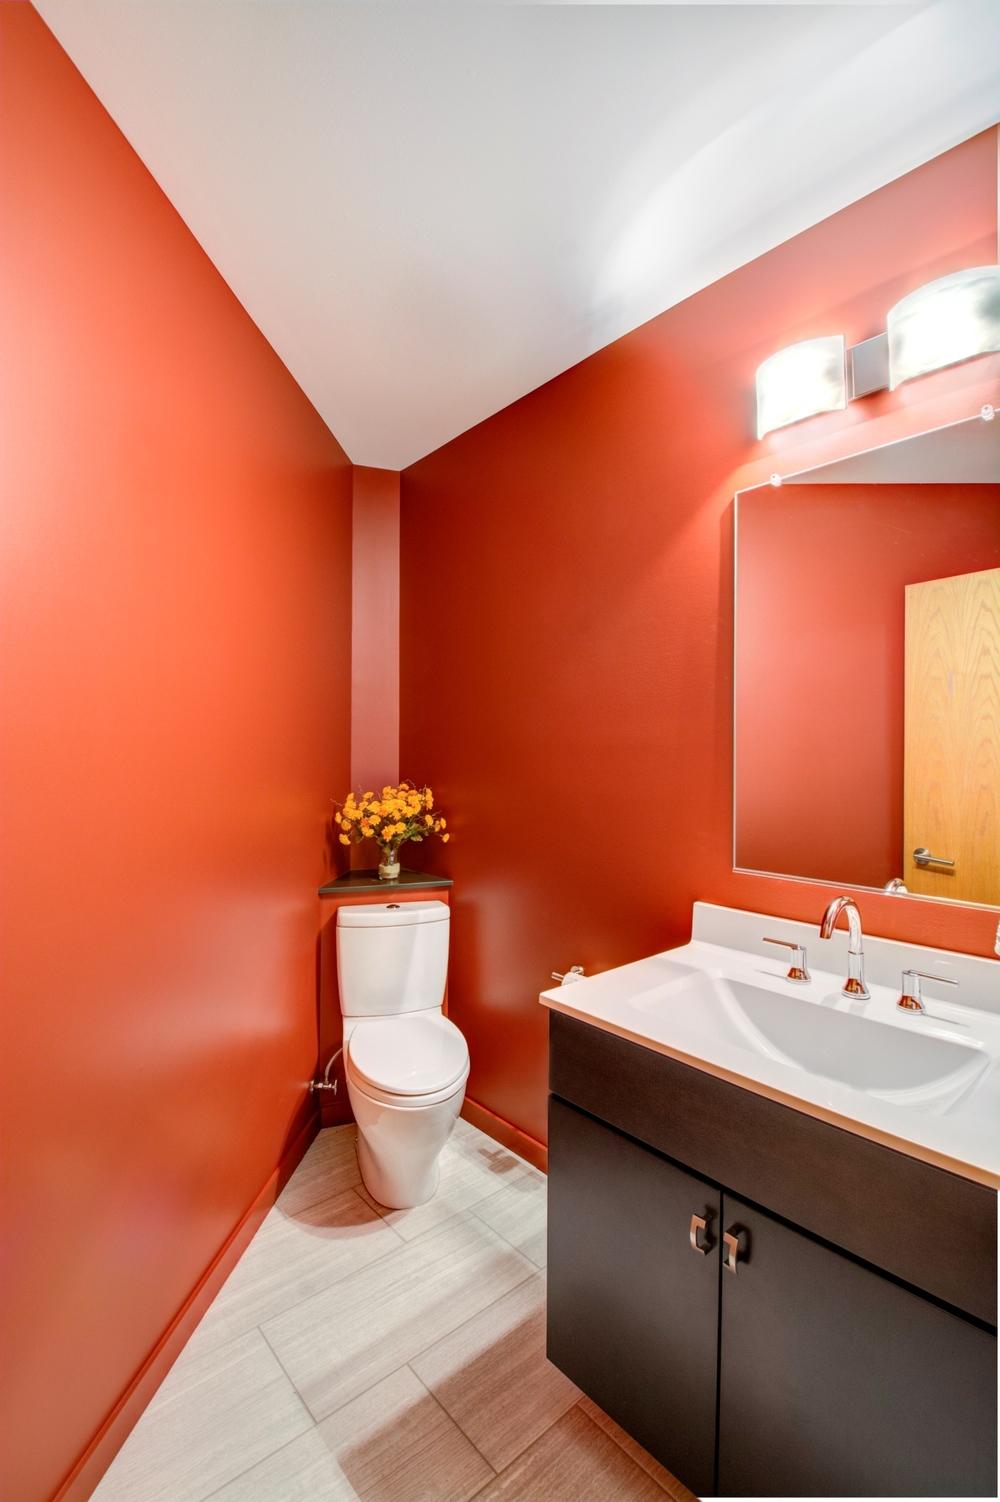 Bathrooms_16.jpg